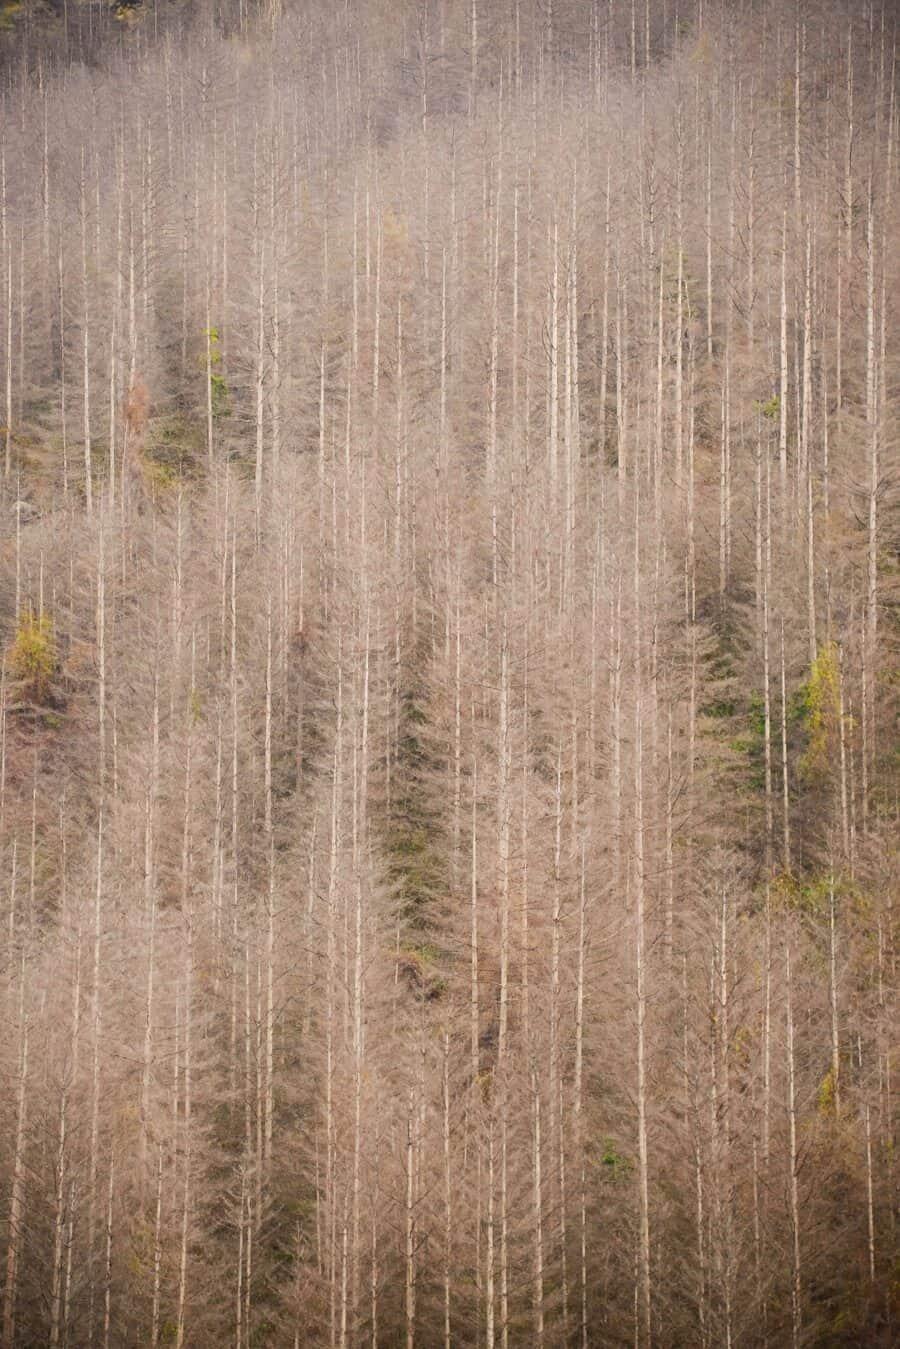 Mountain Designs - Lisa Michele Burns - New Zealand (4)